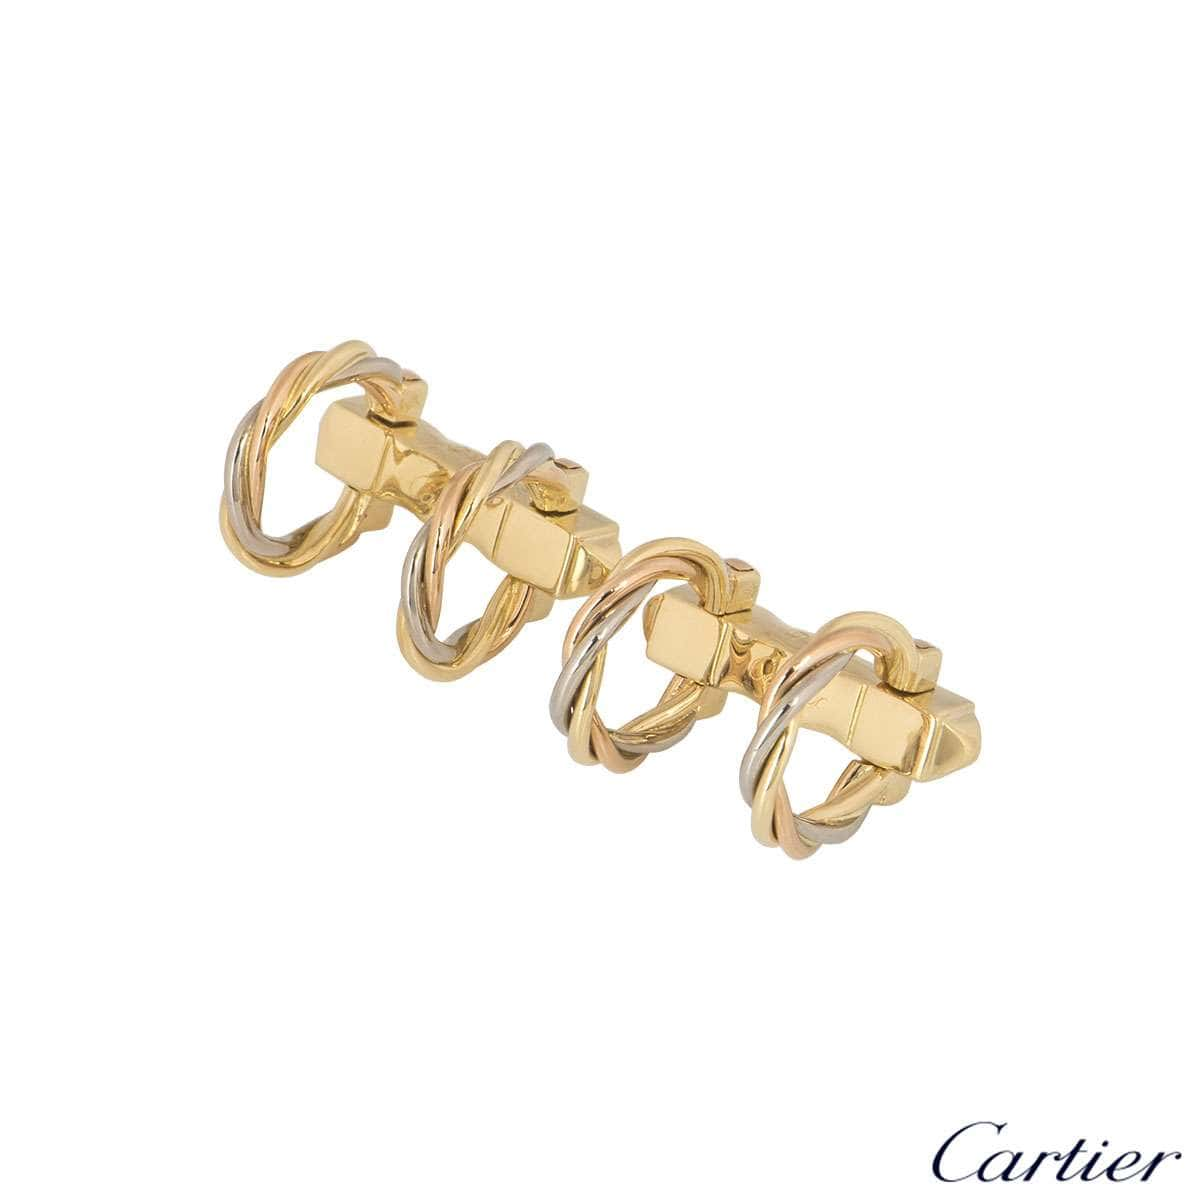 Cartier 18k Tri-Colour Gold Trinity Cufflinks